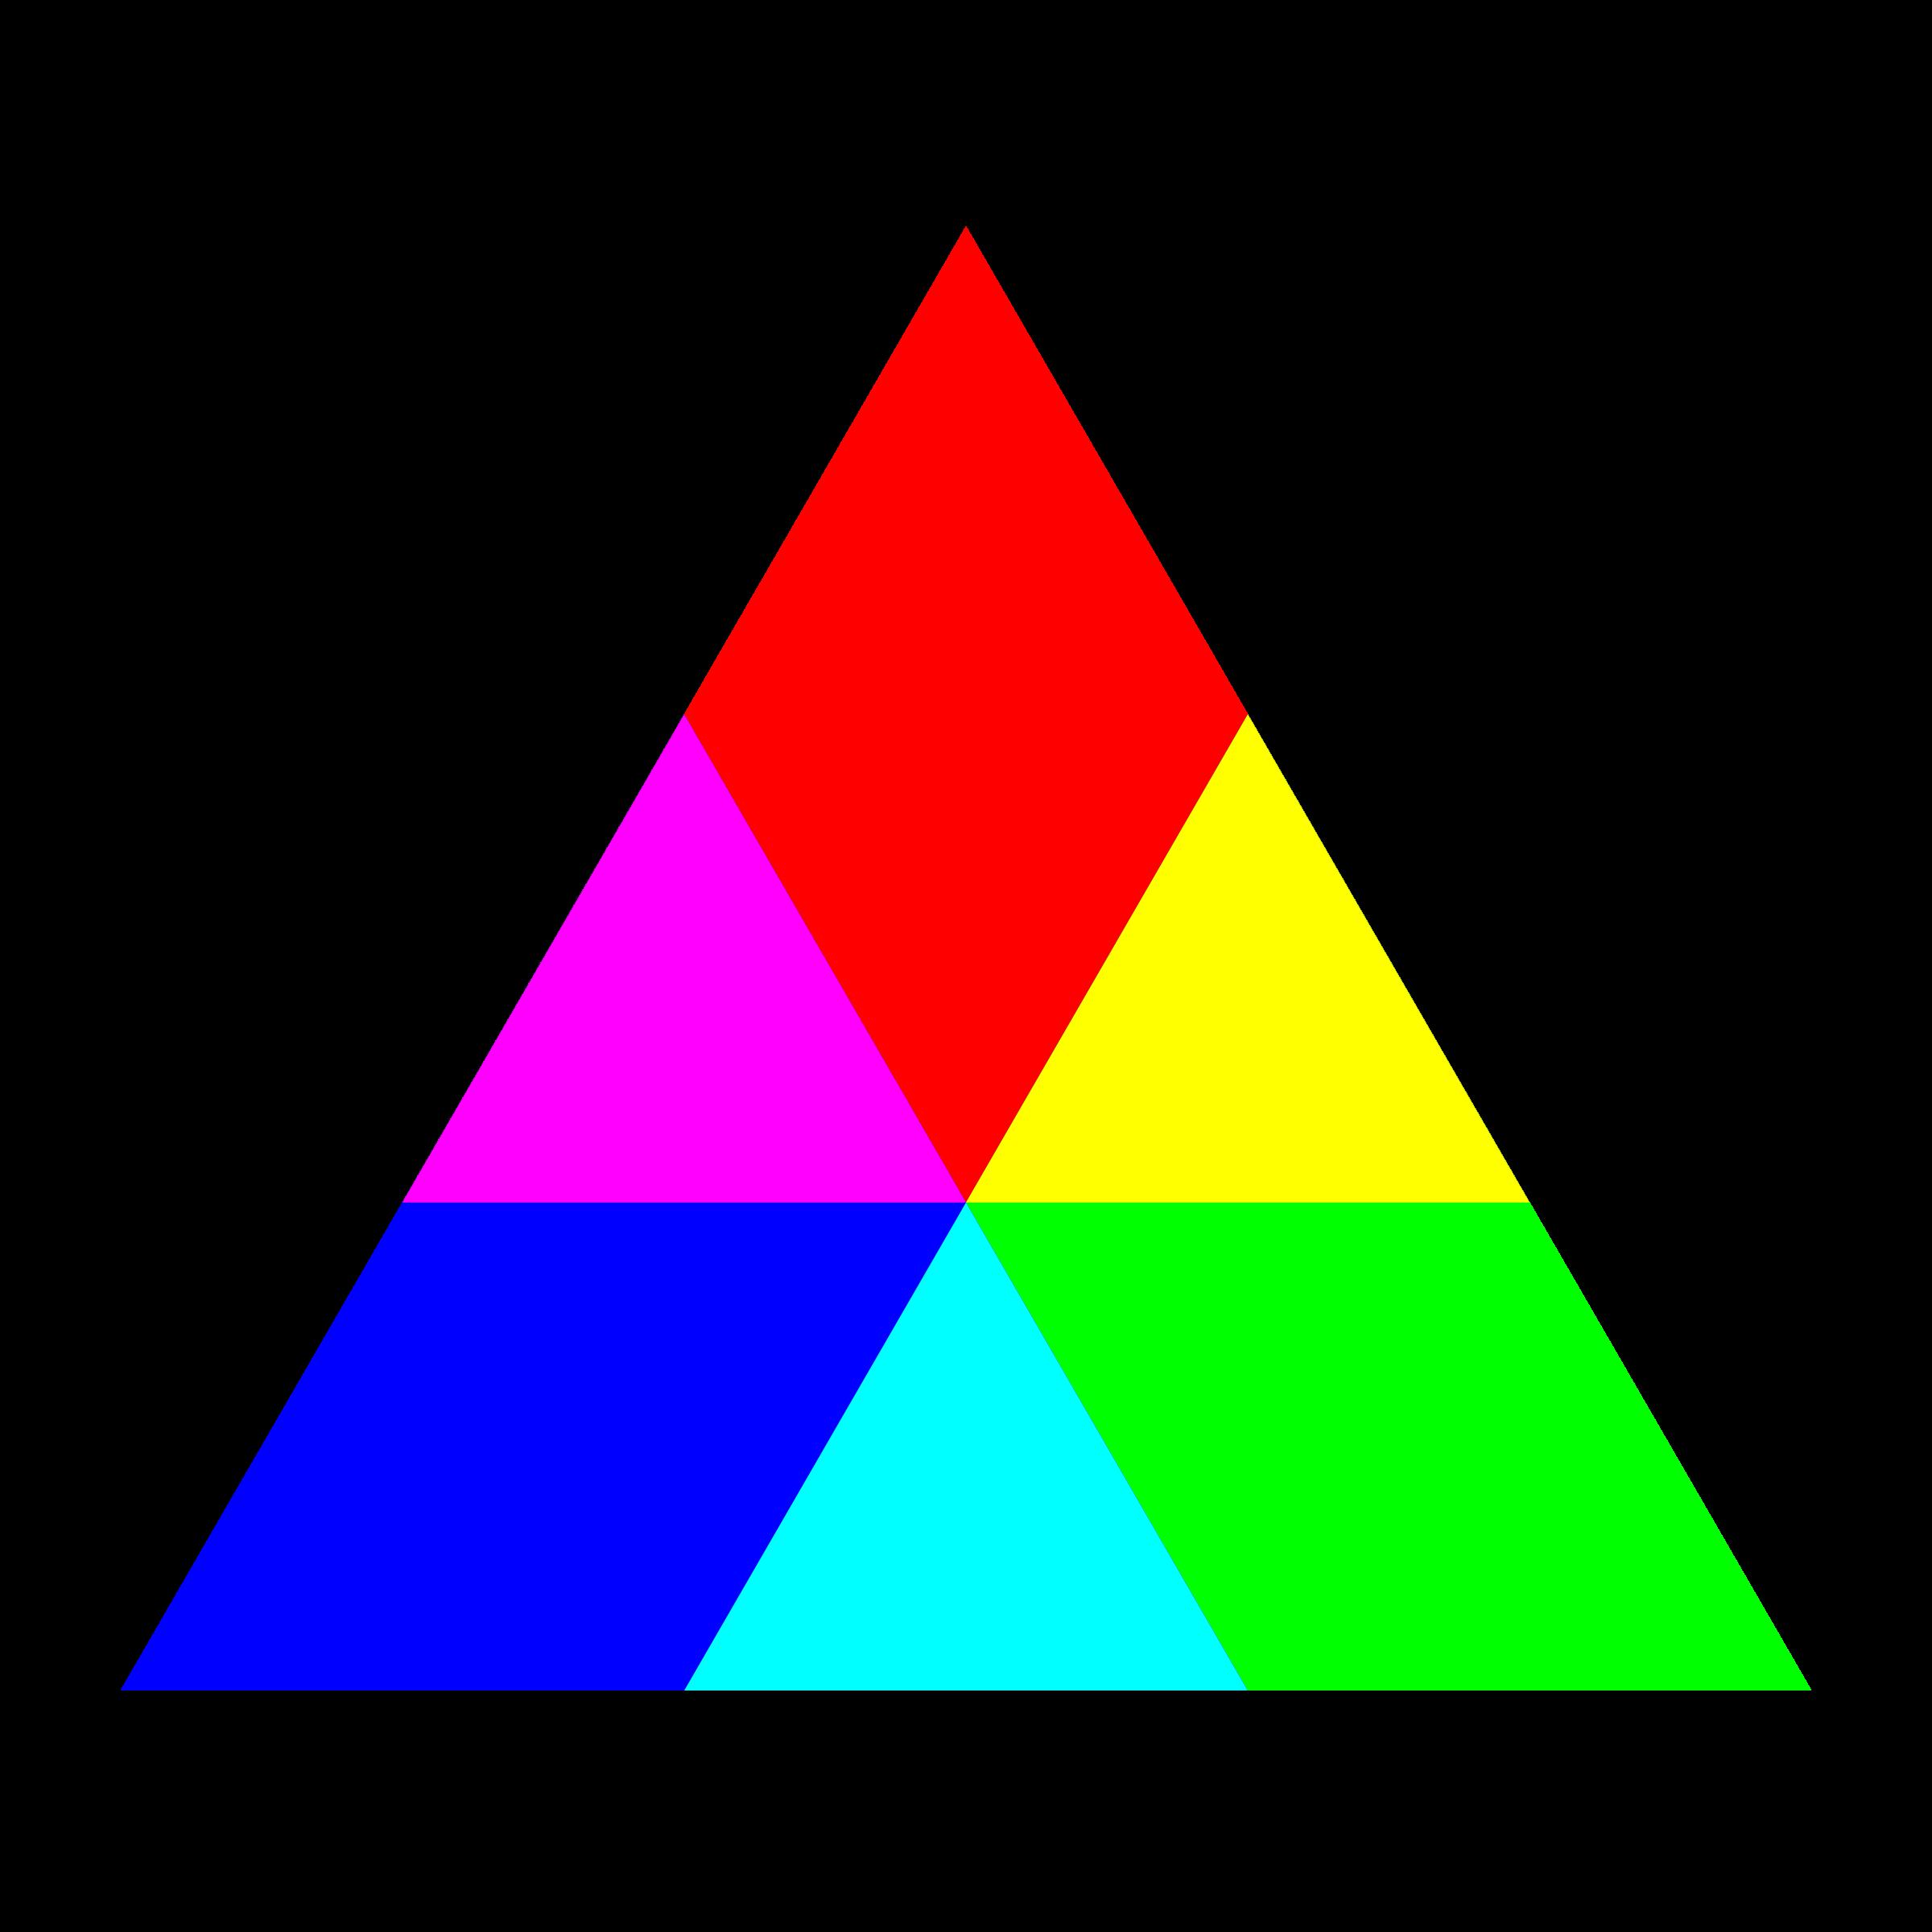 Triangular clipart rgb. Triangle mix big image